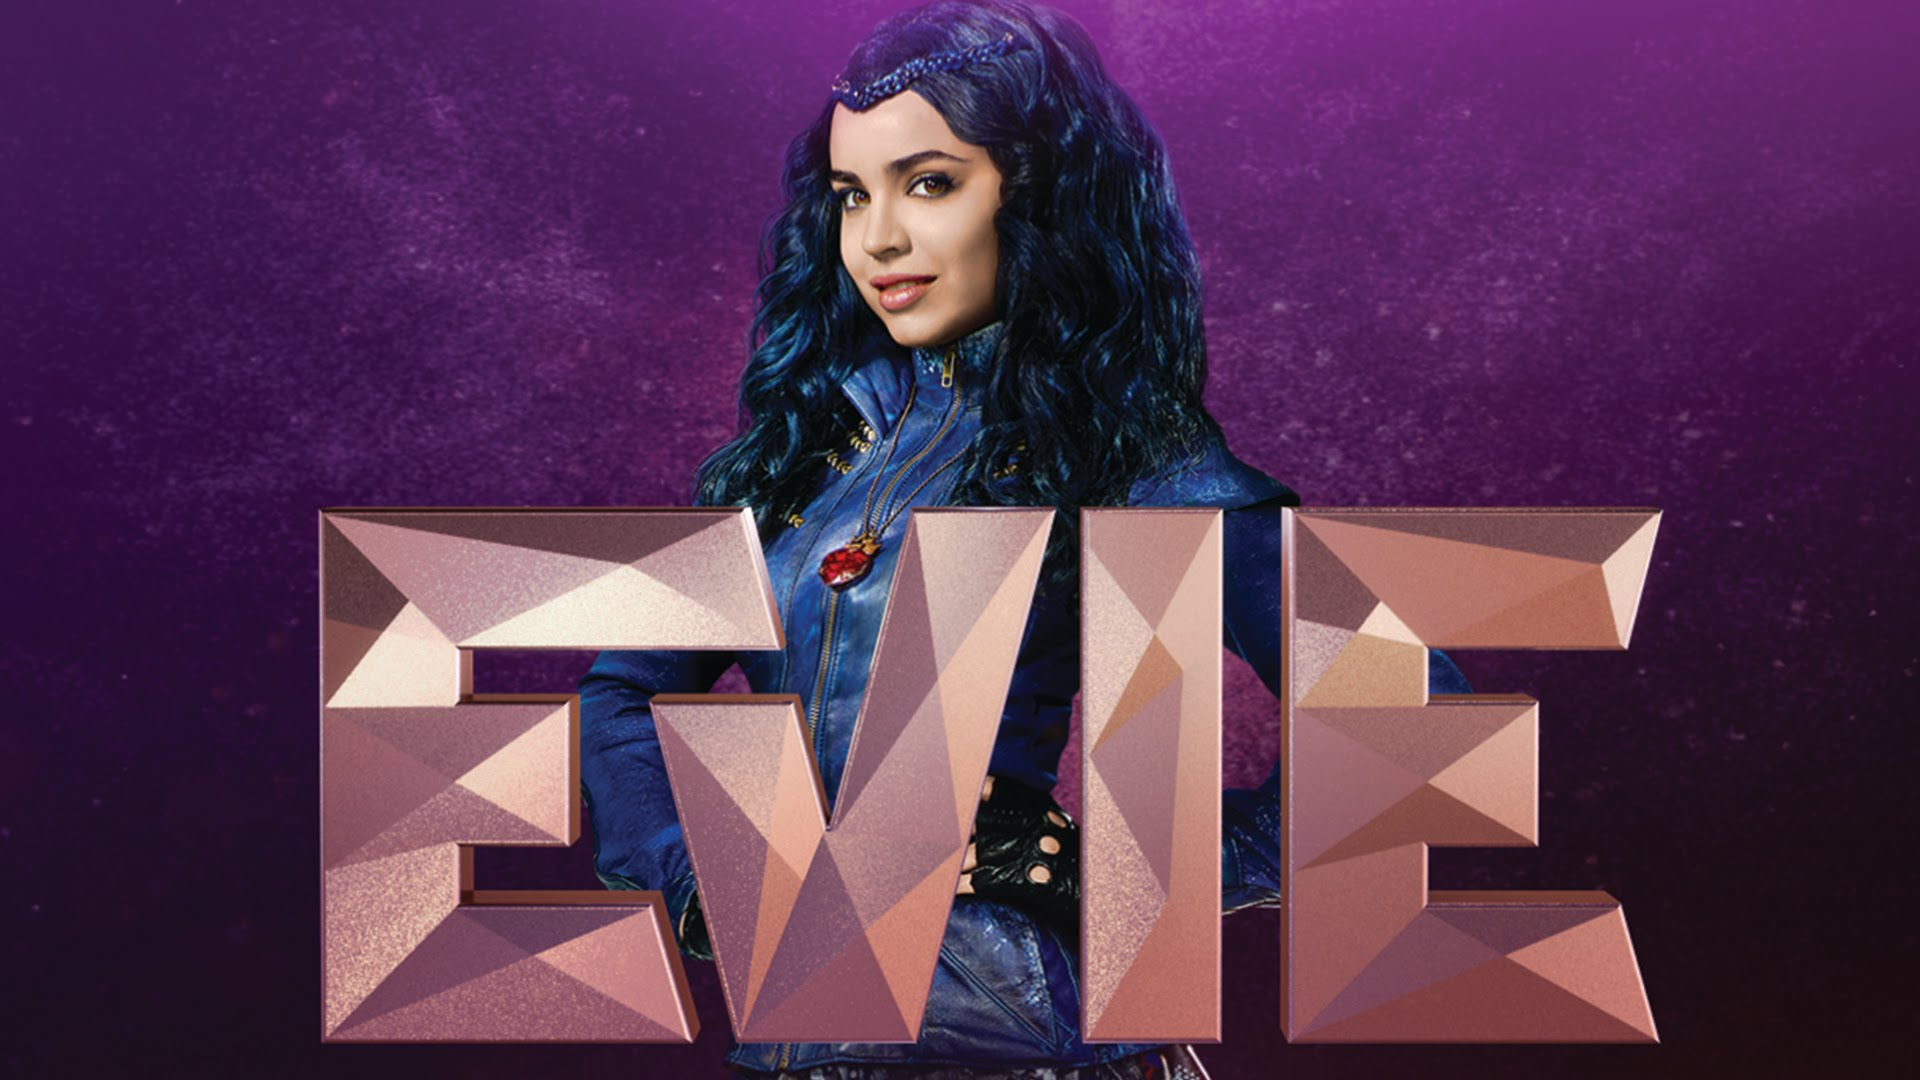 Evie-Sofia-Carson-Descendientes-Full-HD-en-Fondos-1080-wallpaper-wpc5804624